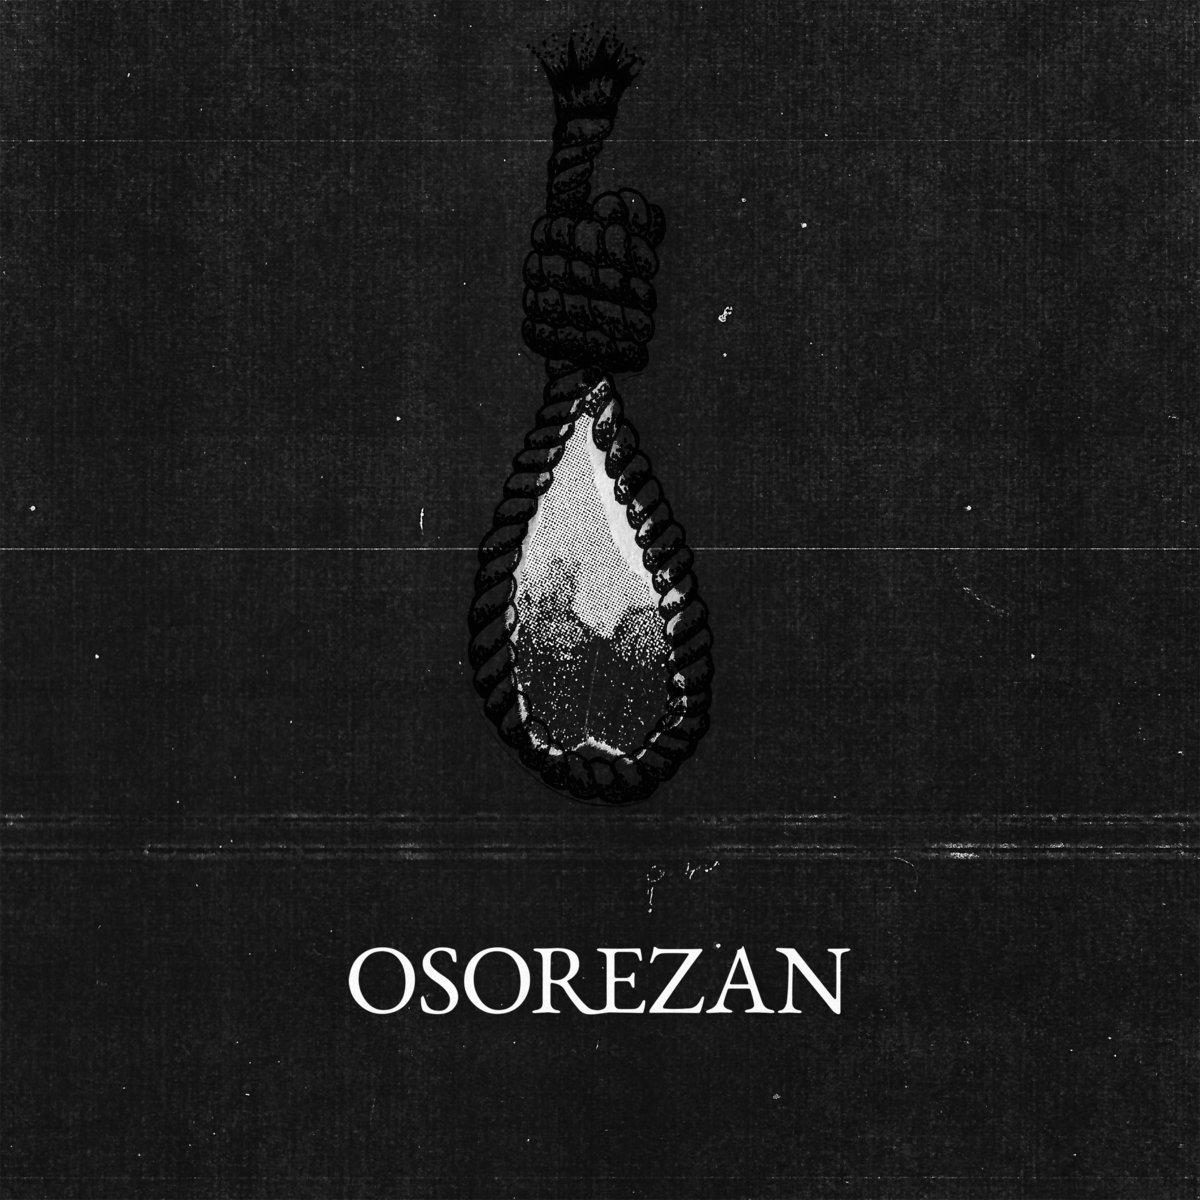 Osorezan – Osorezan (2018)